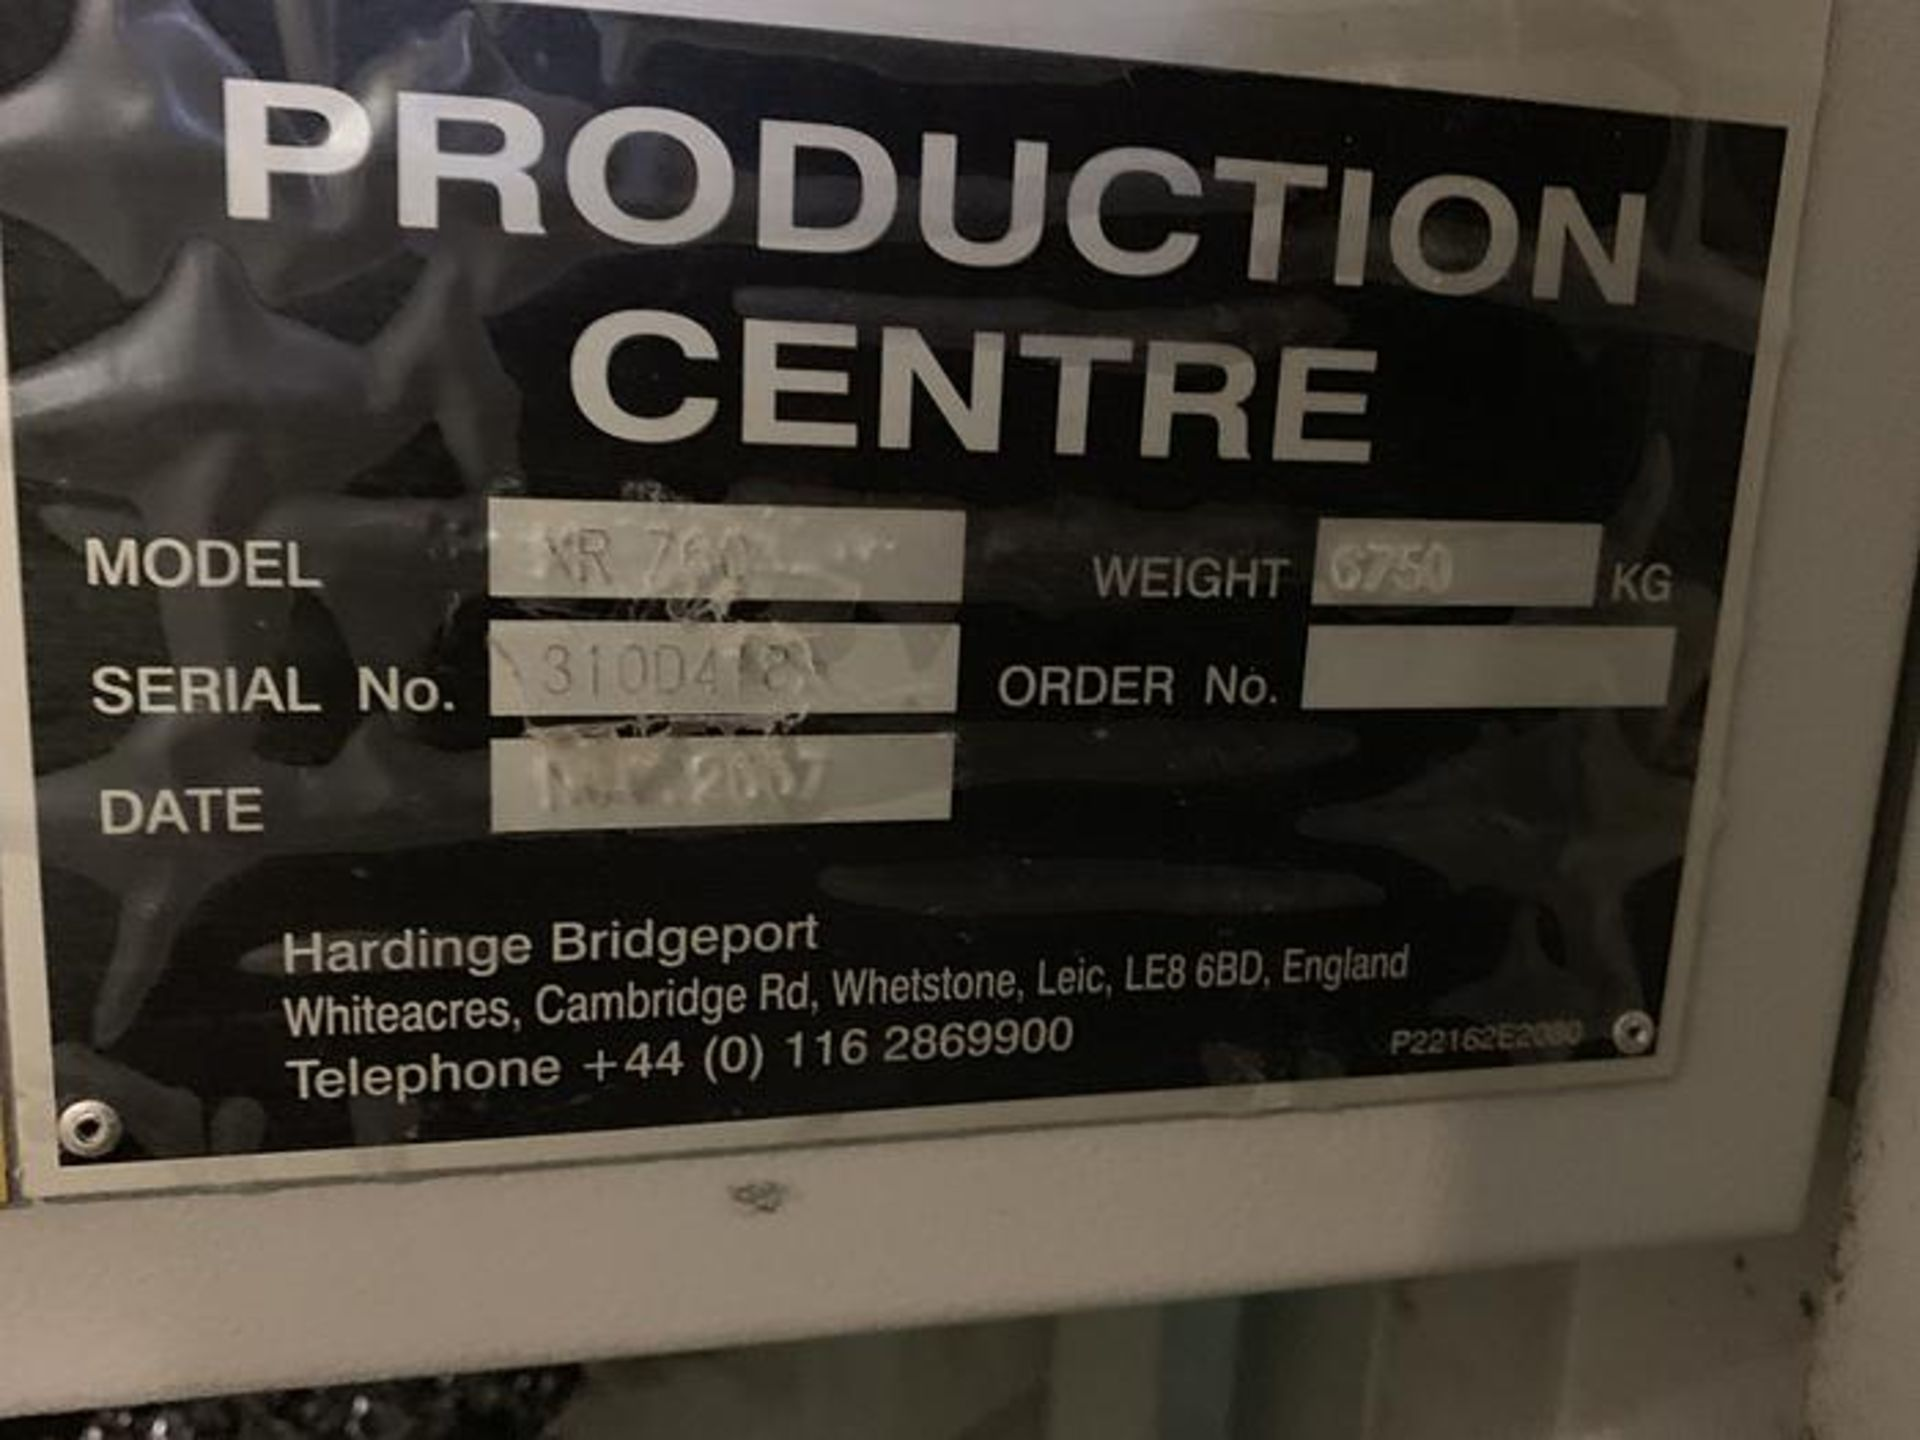 "HARDINGE BRIDGEPORT XR760 CNC VMC PRODUCTION CENTER 30""X24""X24"". YEAR 2007, SN 310D418 - Image 14 of 16"